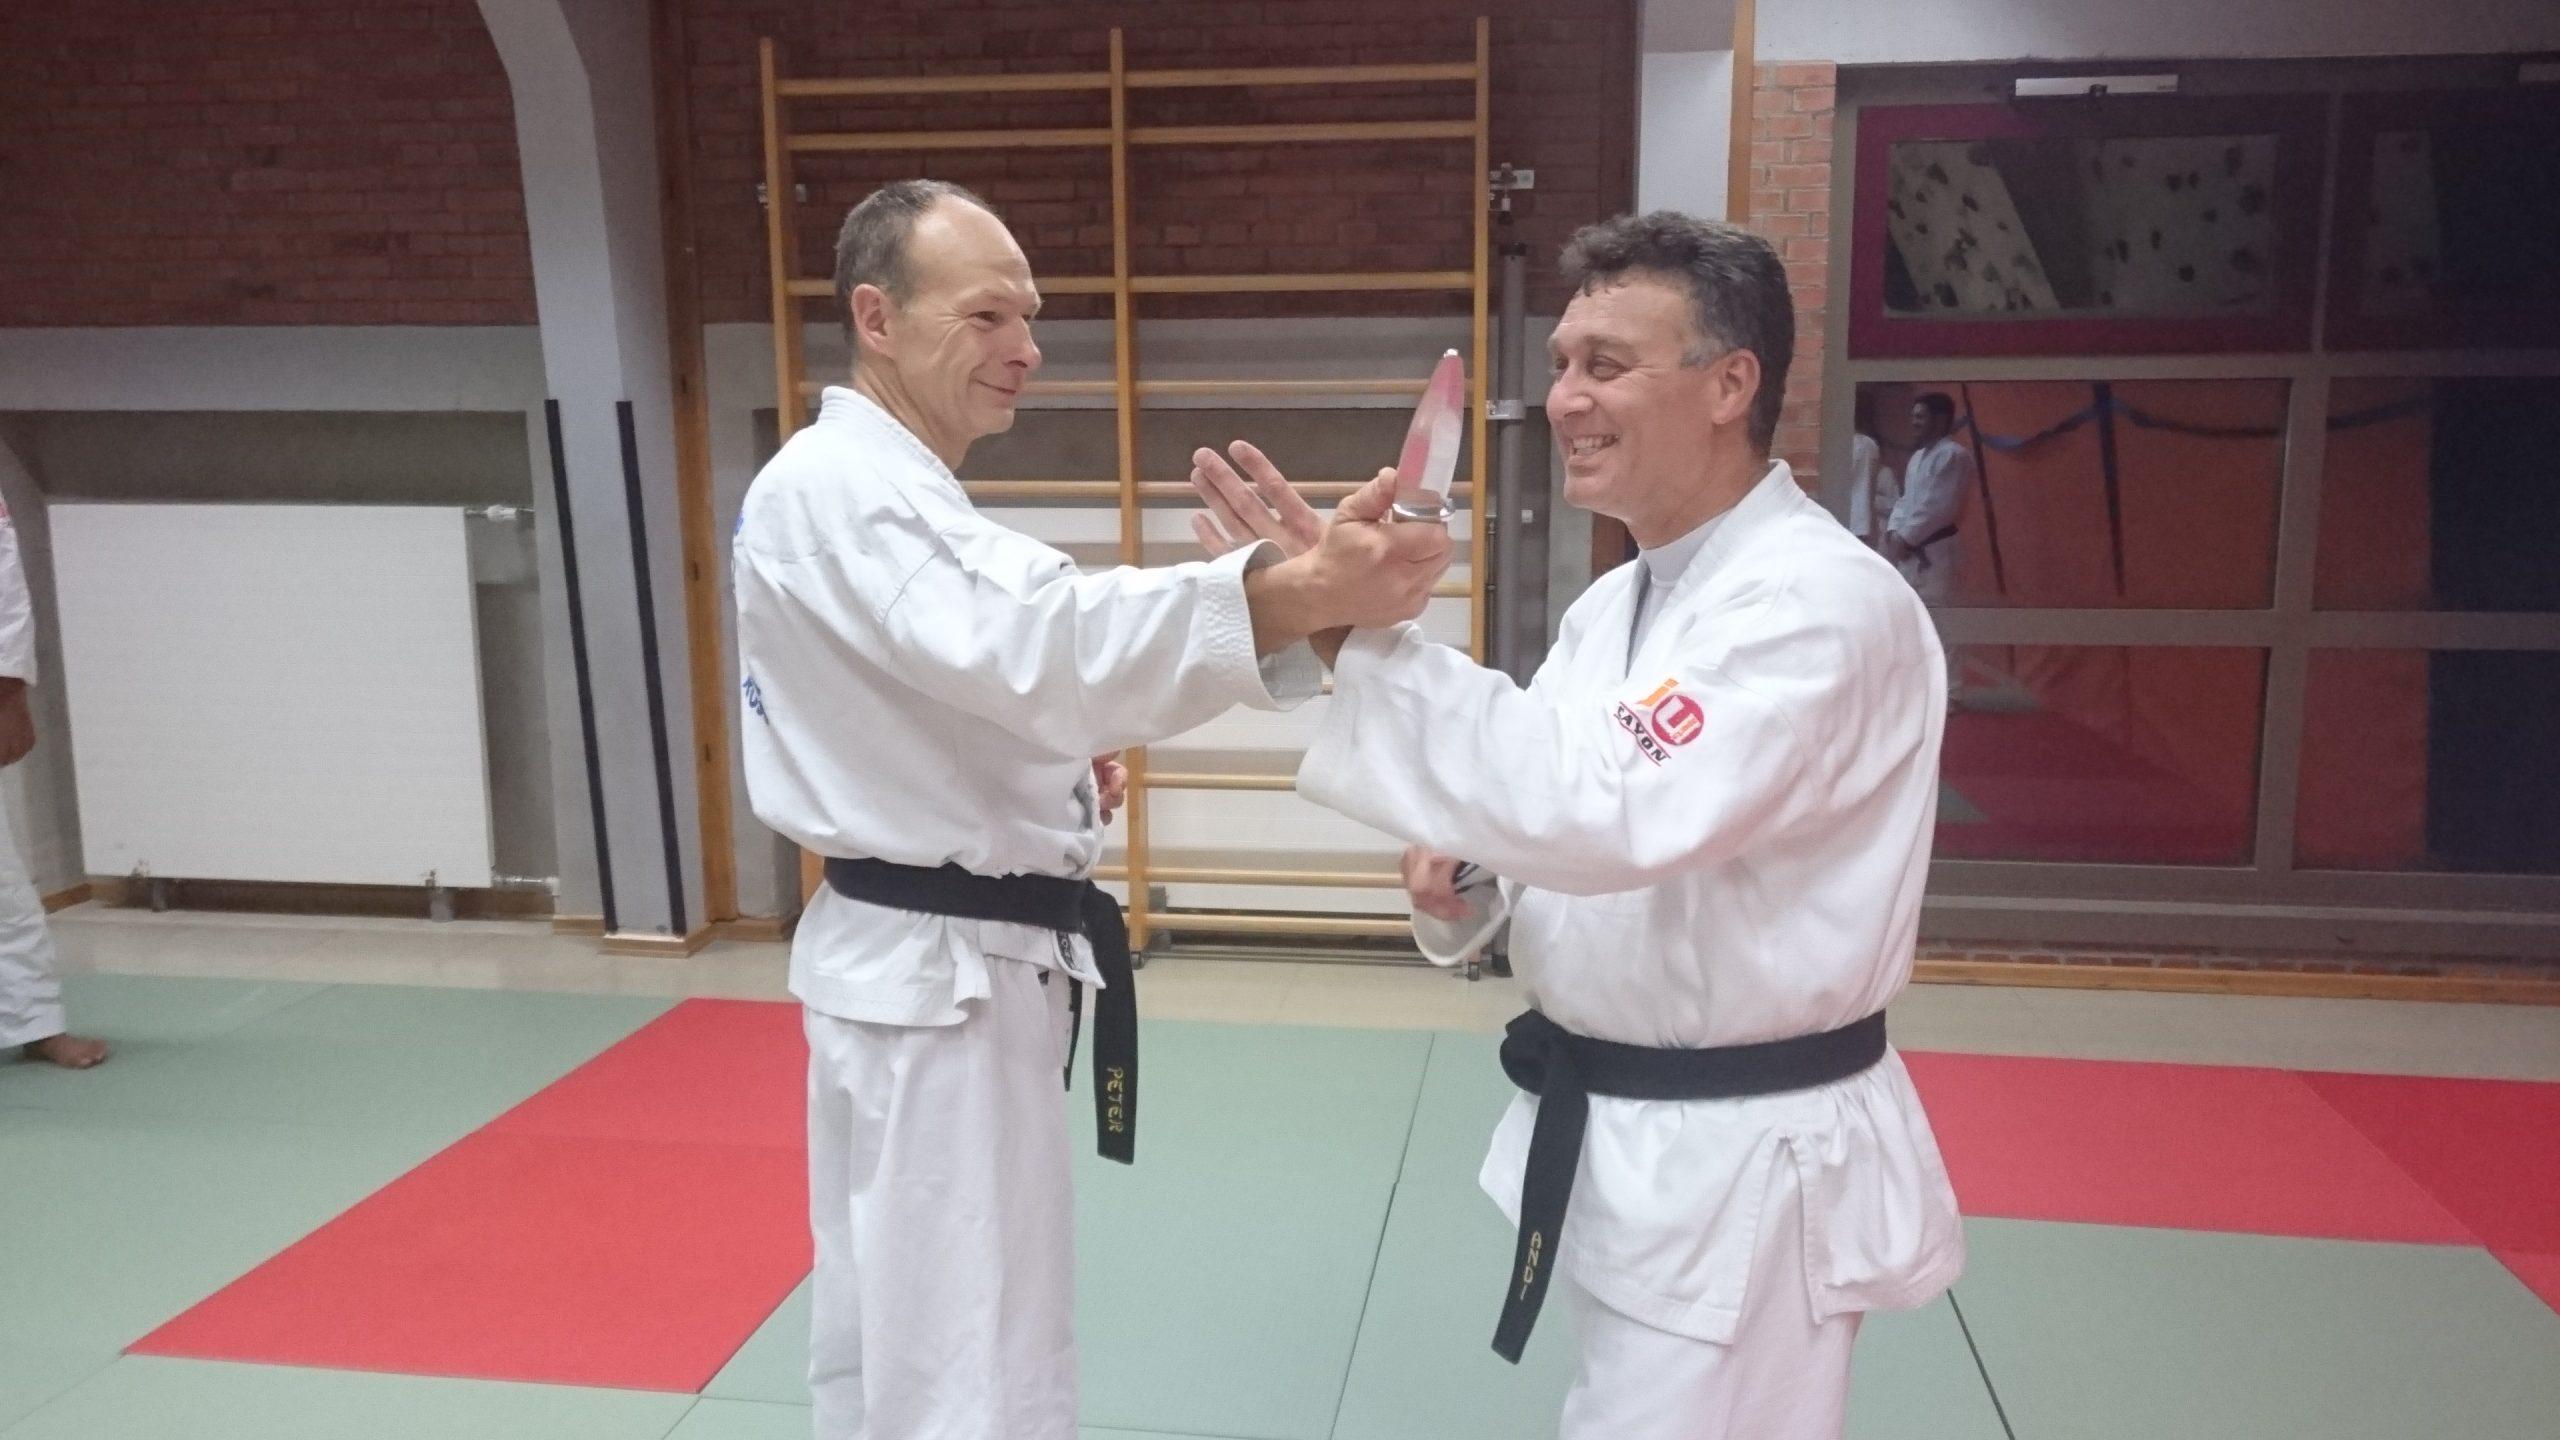 Ueber_uns_EW_Training_1